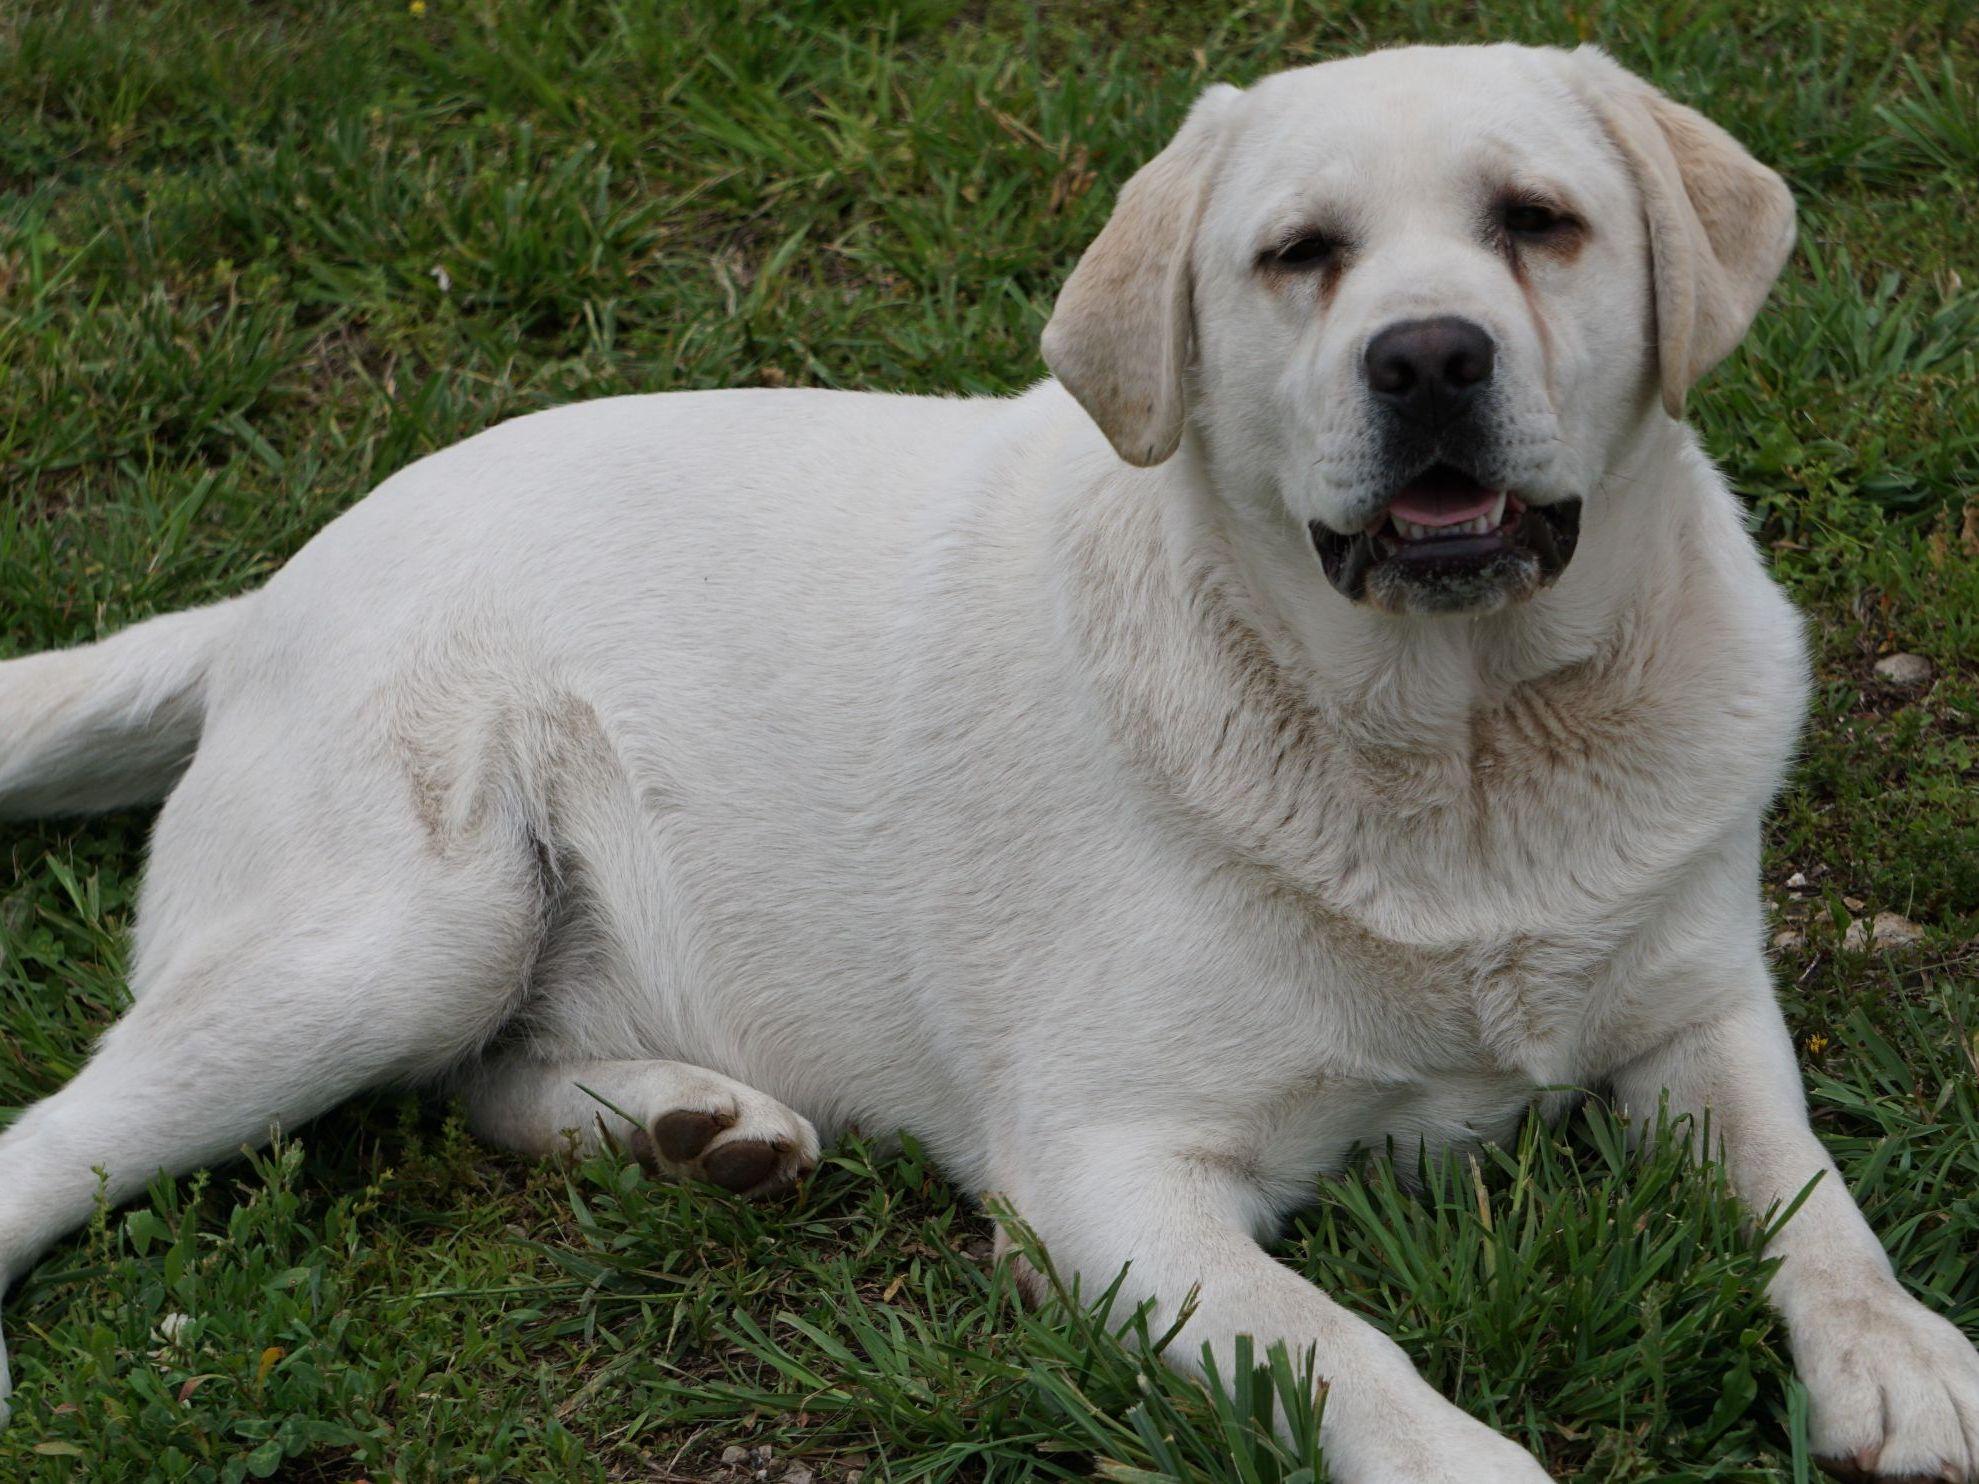 Labrador Retriever Puppies For Sale - $500 Each.